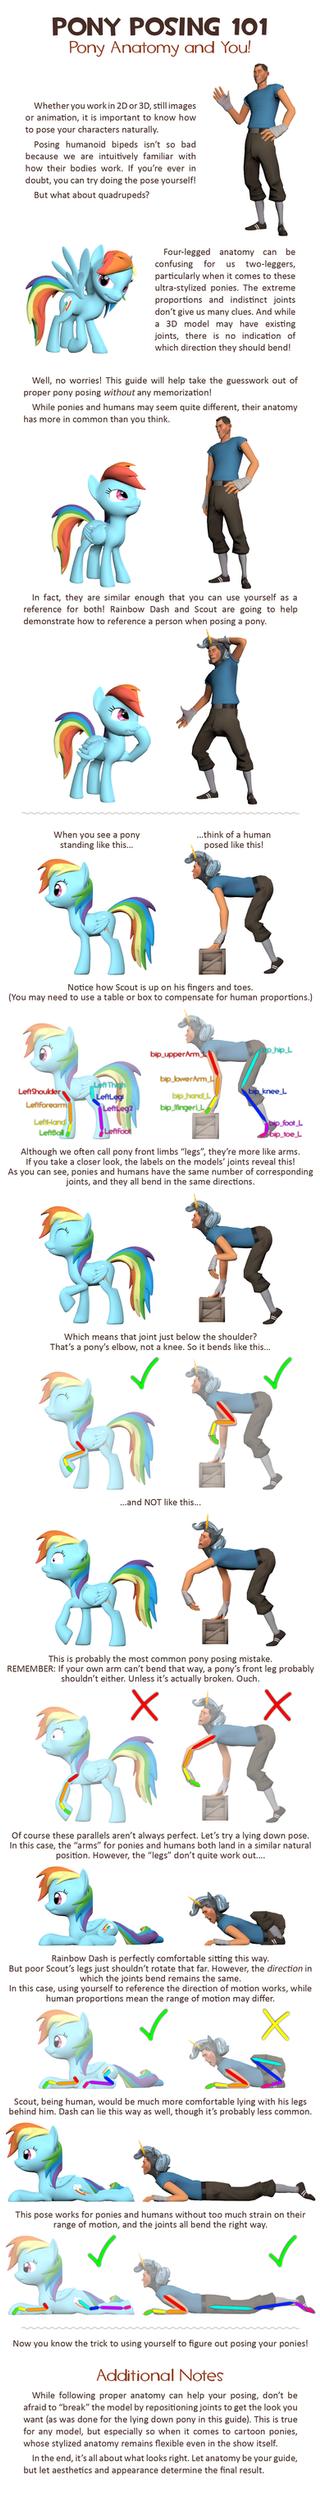 Pony Posing 101 by love-mist